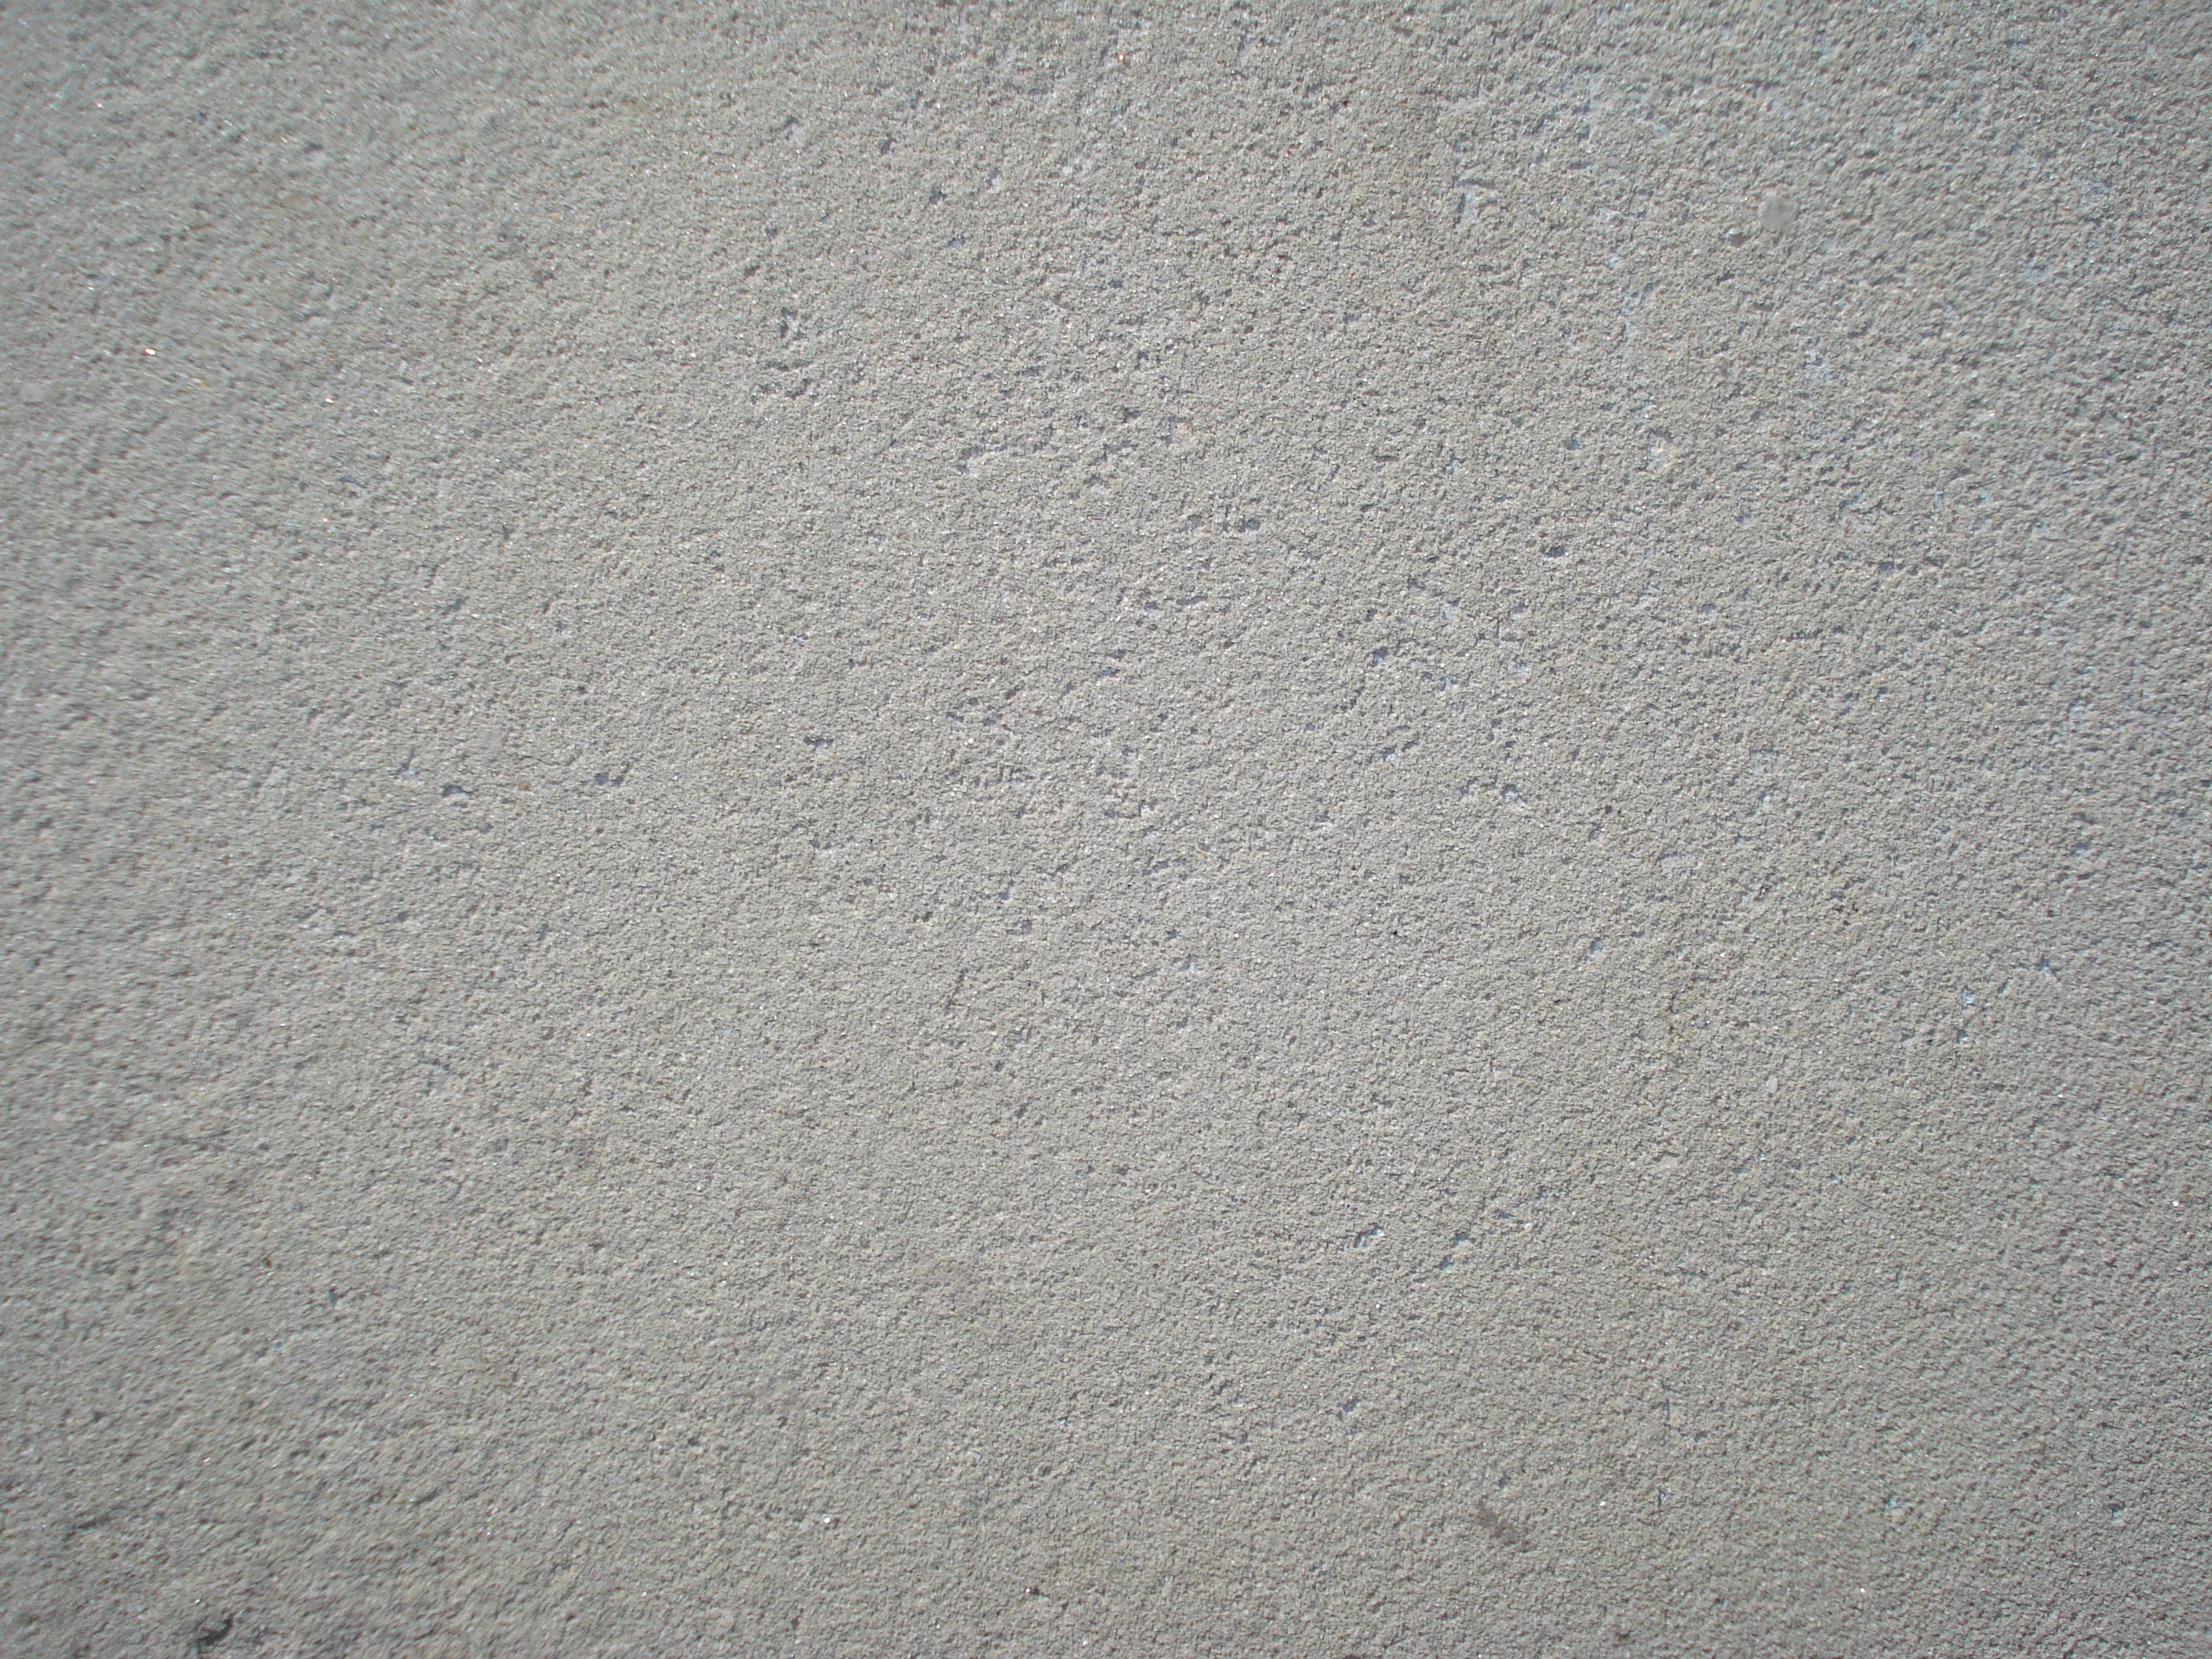 texture stone by celeste2786